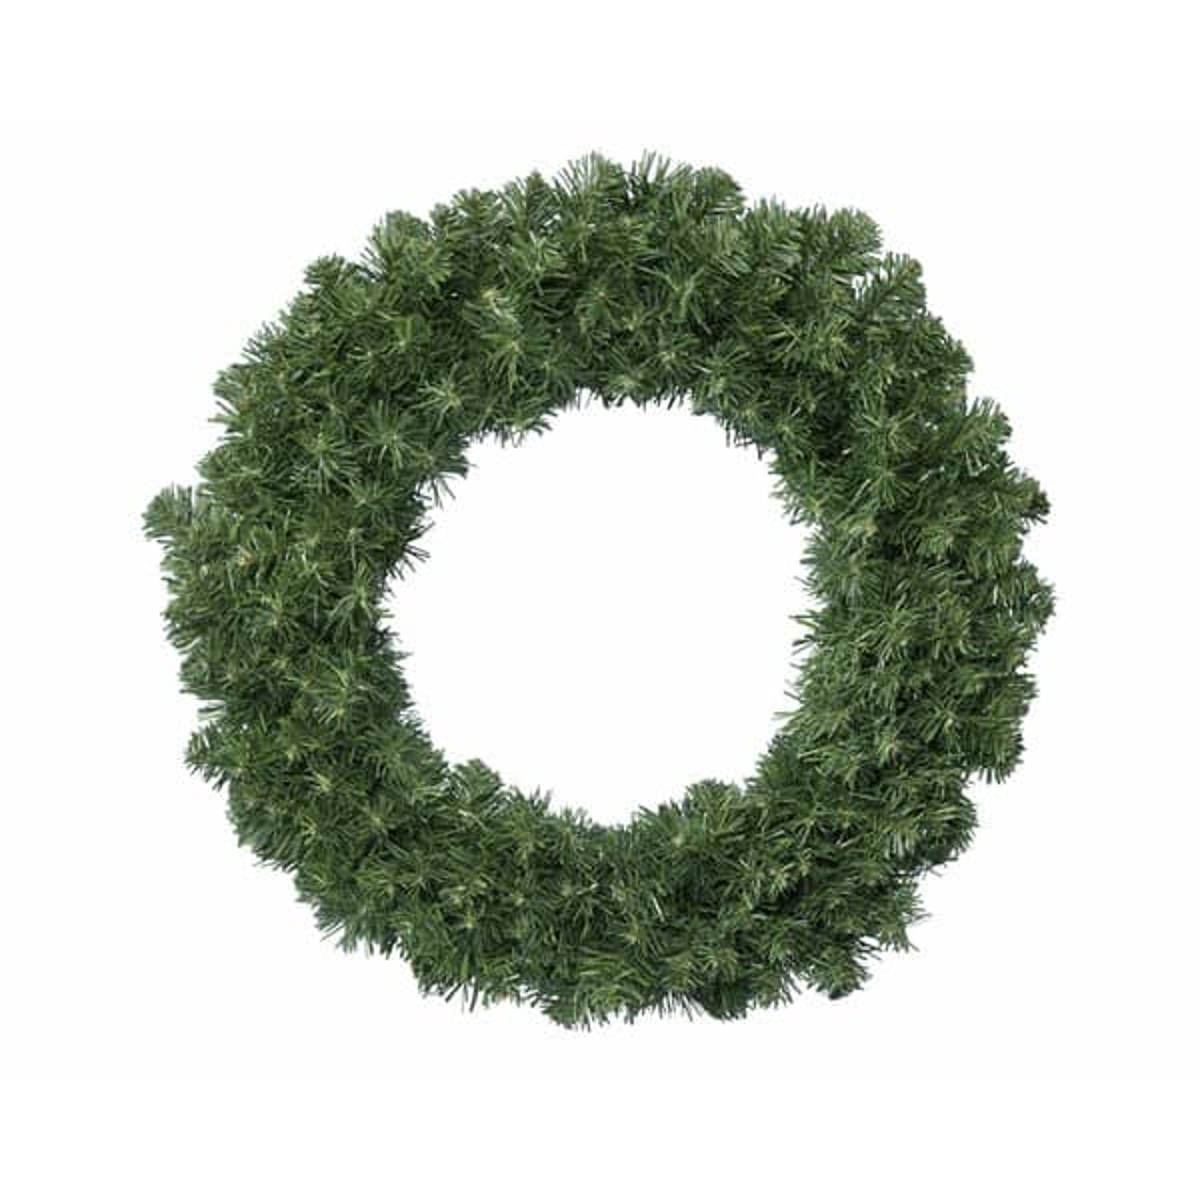 Kaemingk Everlands Imperial Wreath 50cm Diameter